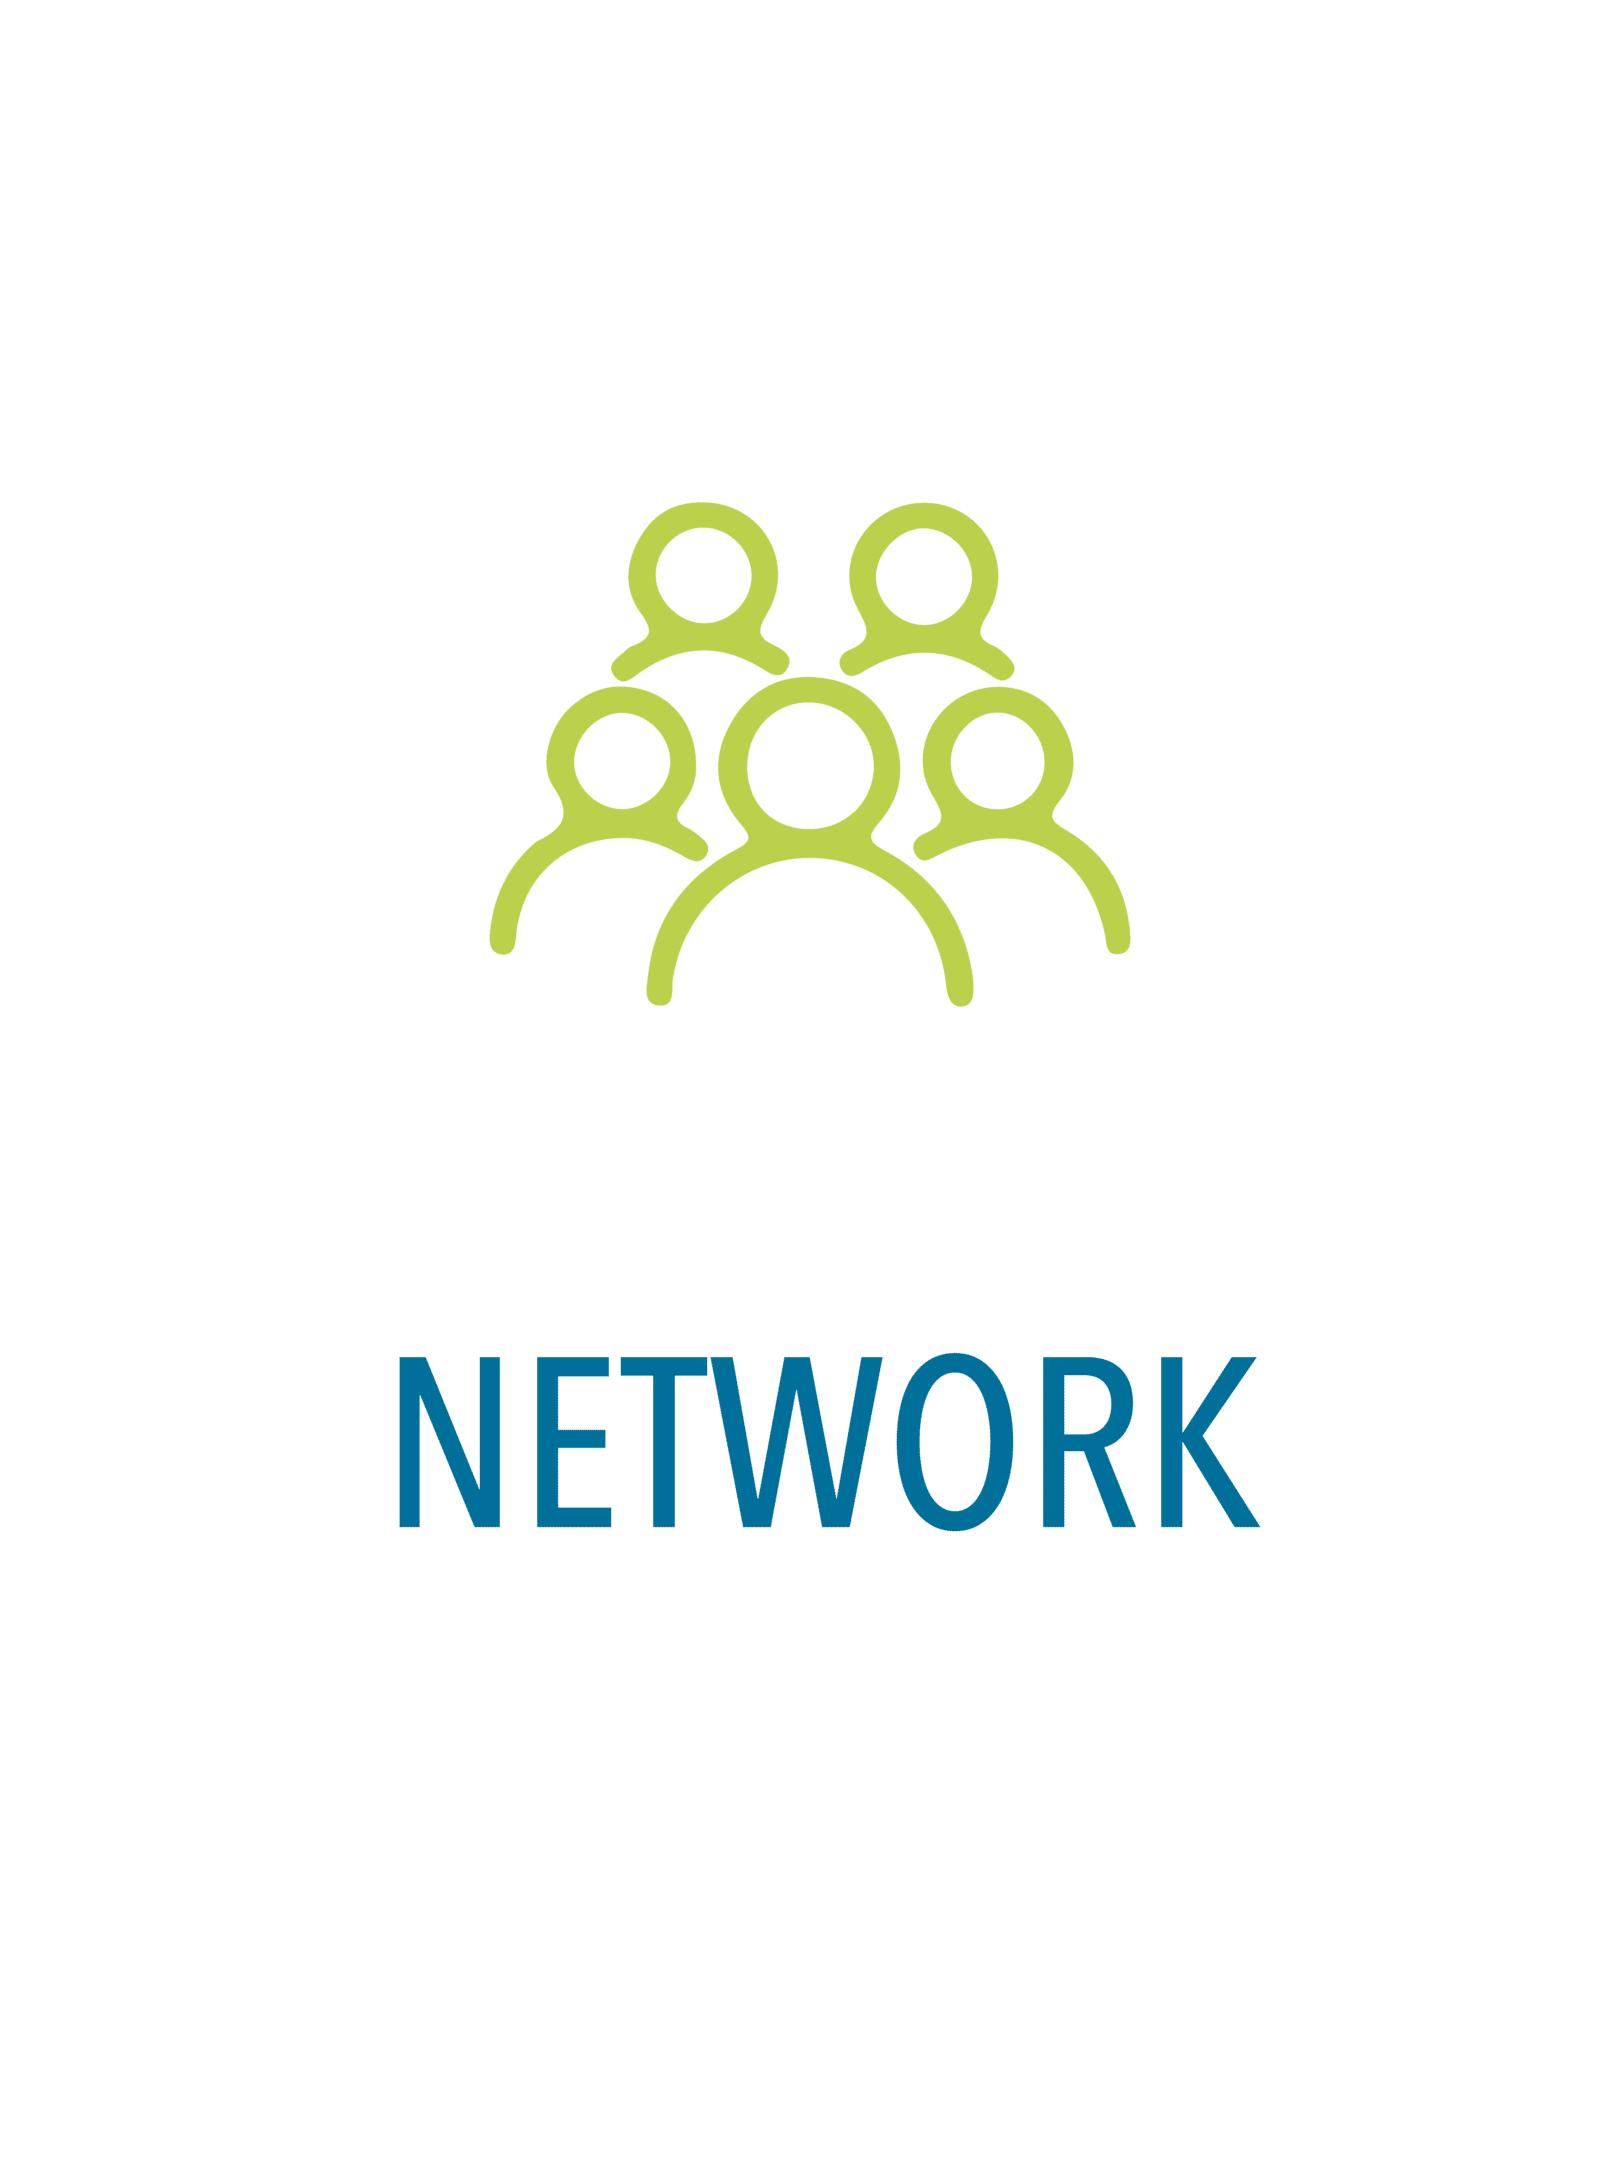 network-01